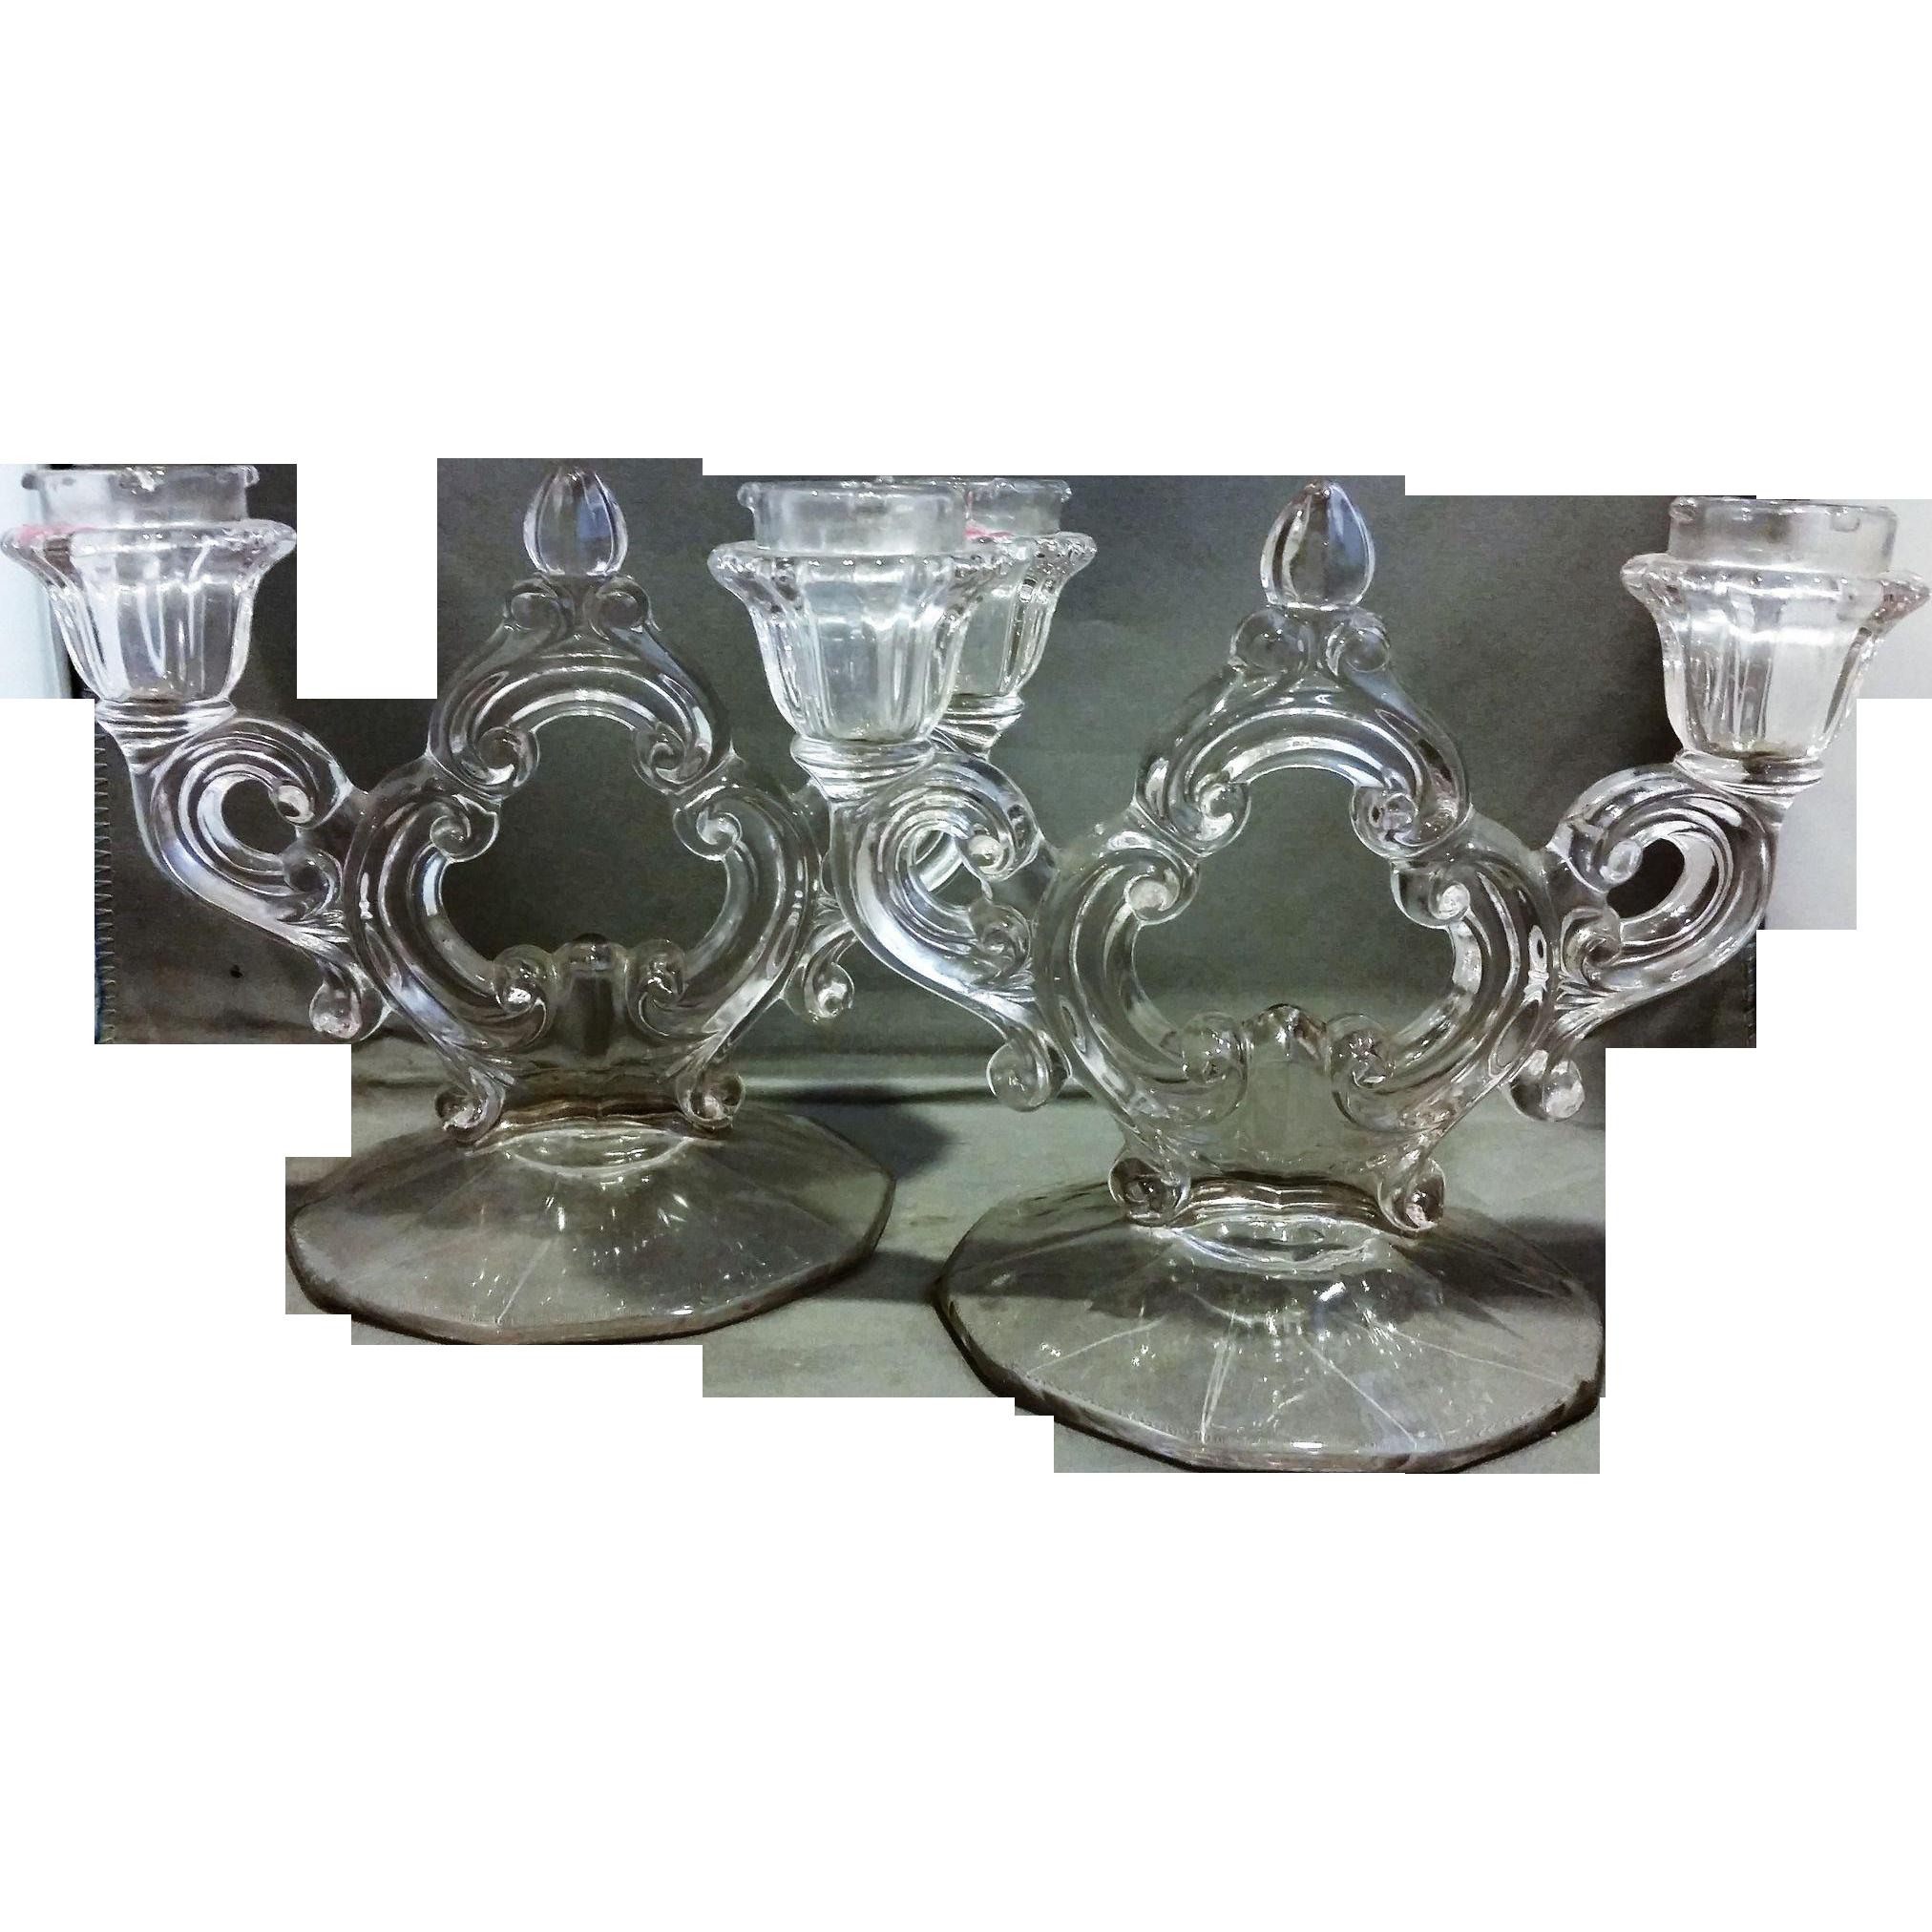 Cambridge Decagon Keyhole Double Light Candleholders Pair Clear Glass Elegant